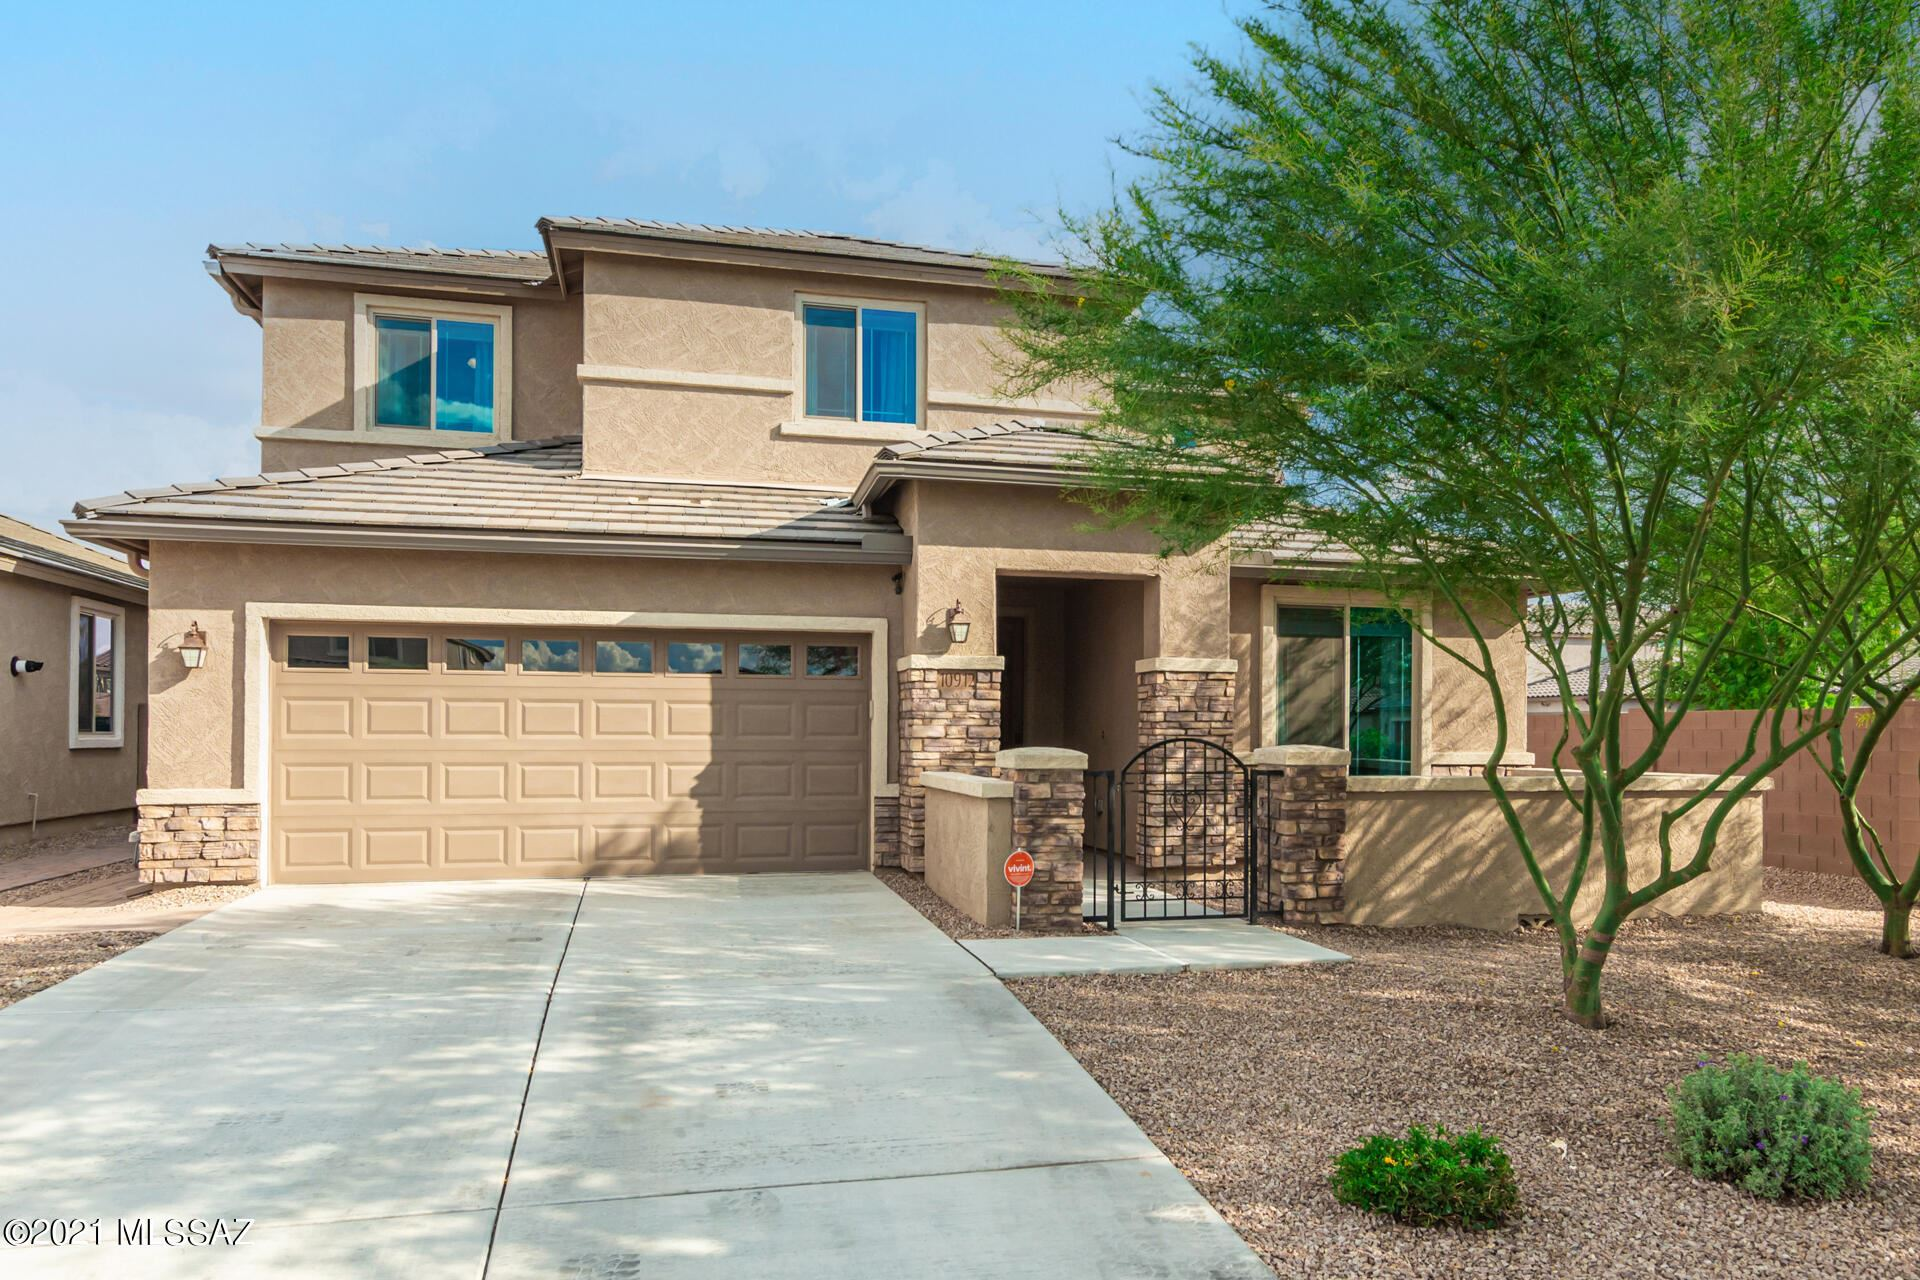 10912 E Higan Cherry Lane, Tucson, AZ 85747 - MLS#: 22119472